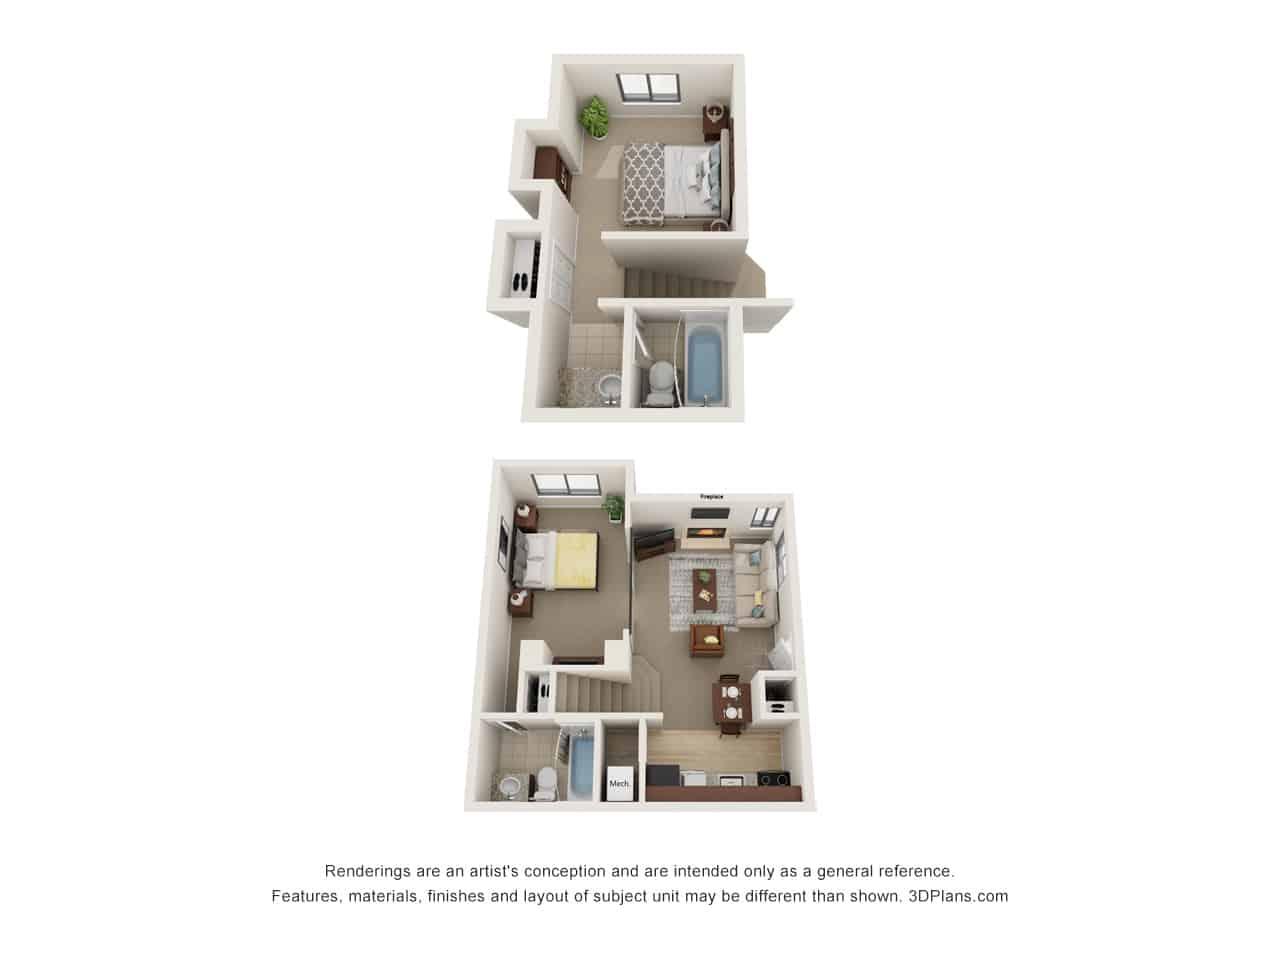 2 Bedroom - 2 Floors